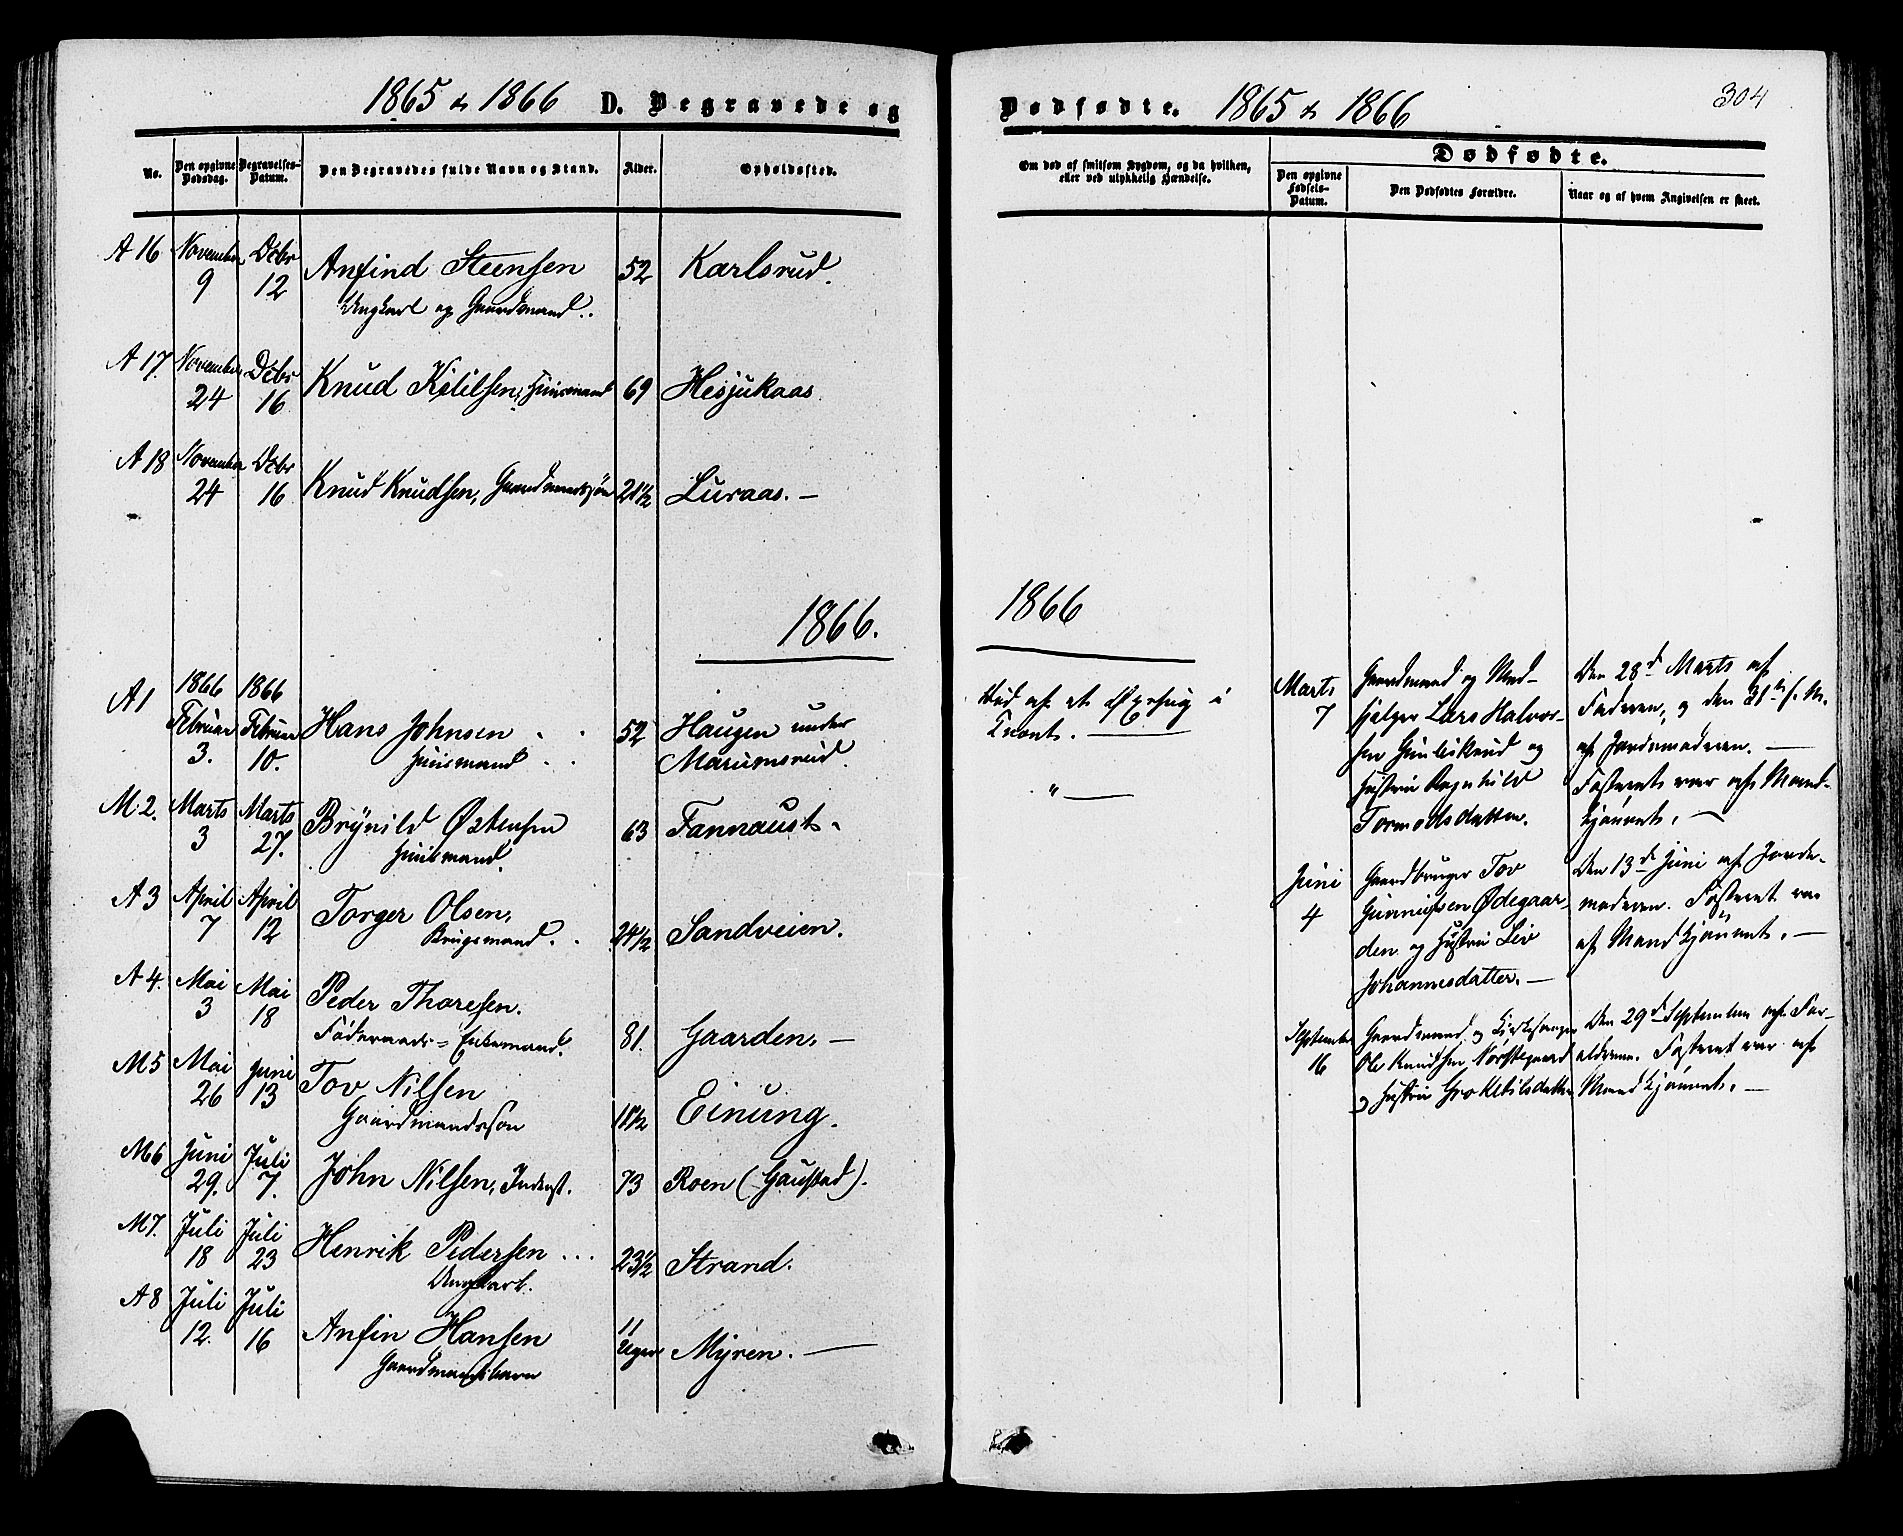 SAKO, Tinn kirkebøker, F/Fa/L0006: Ministerialbok nr. I 6, 1857-1878, s. 304